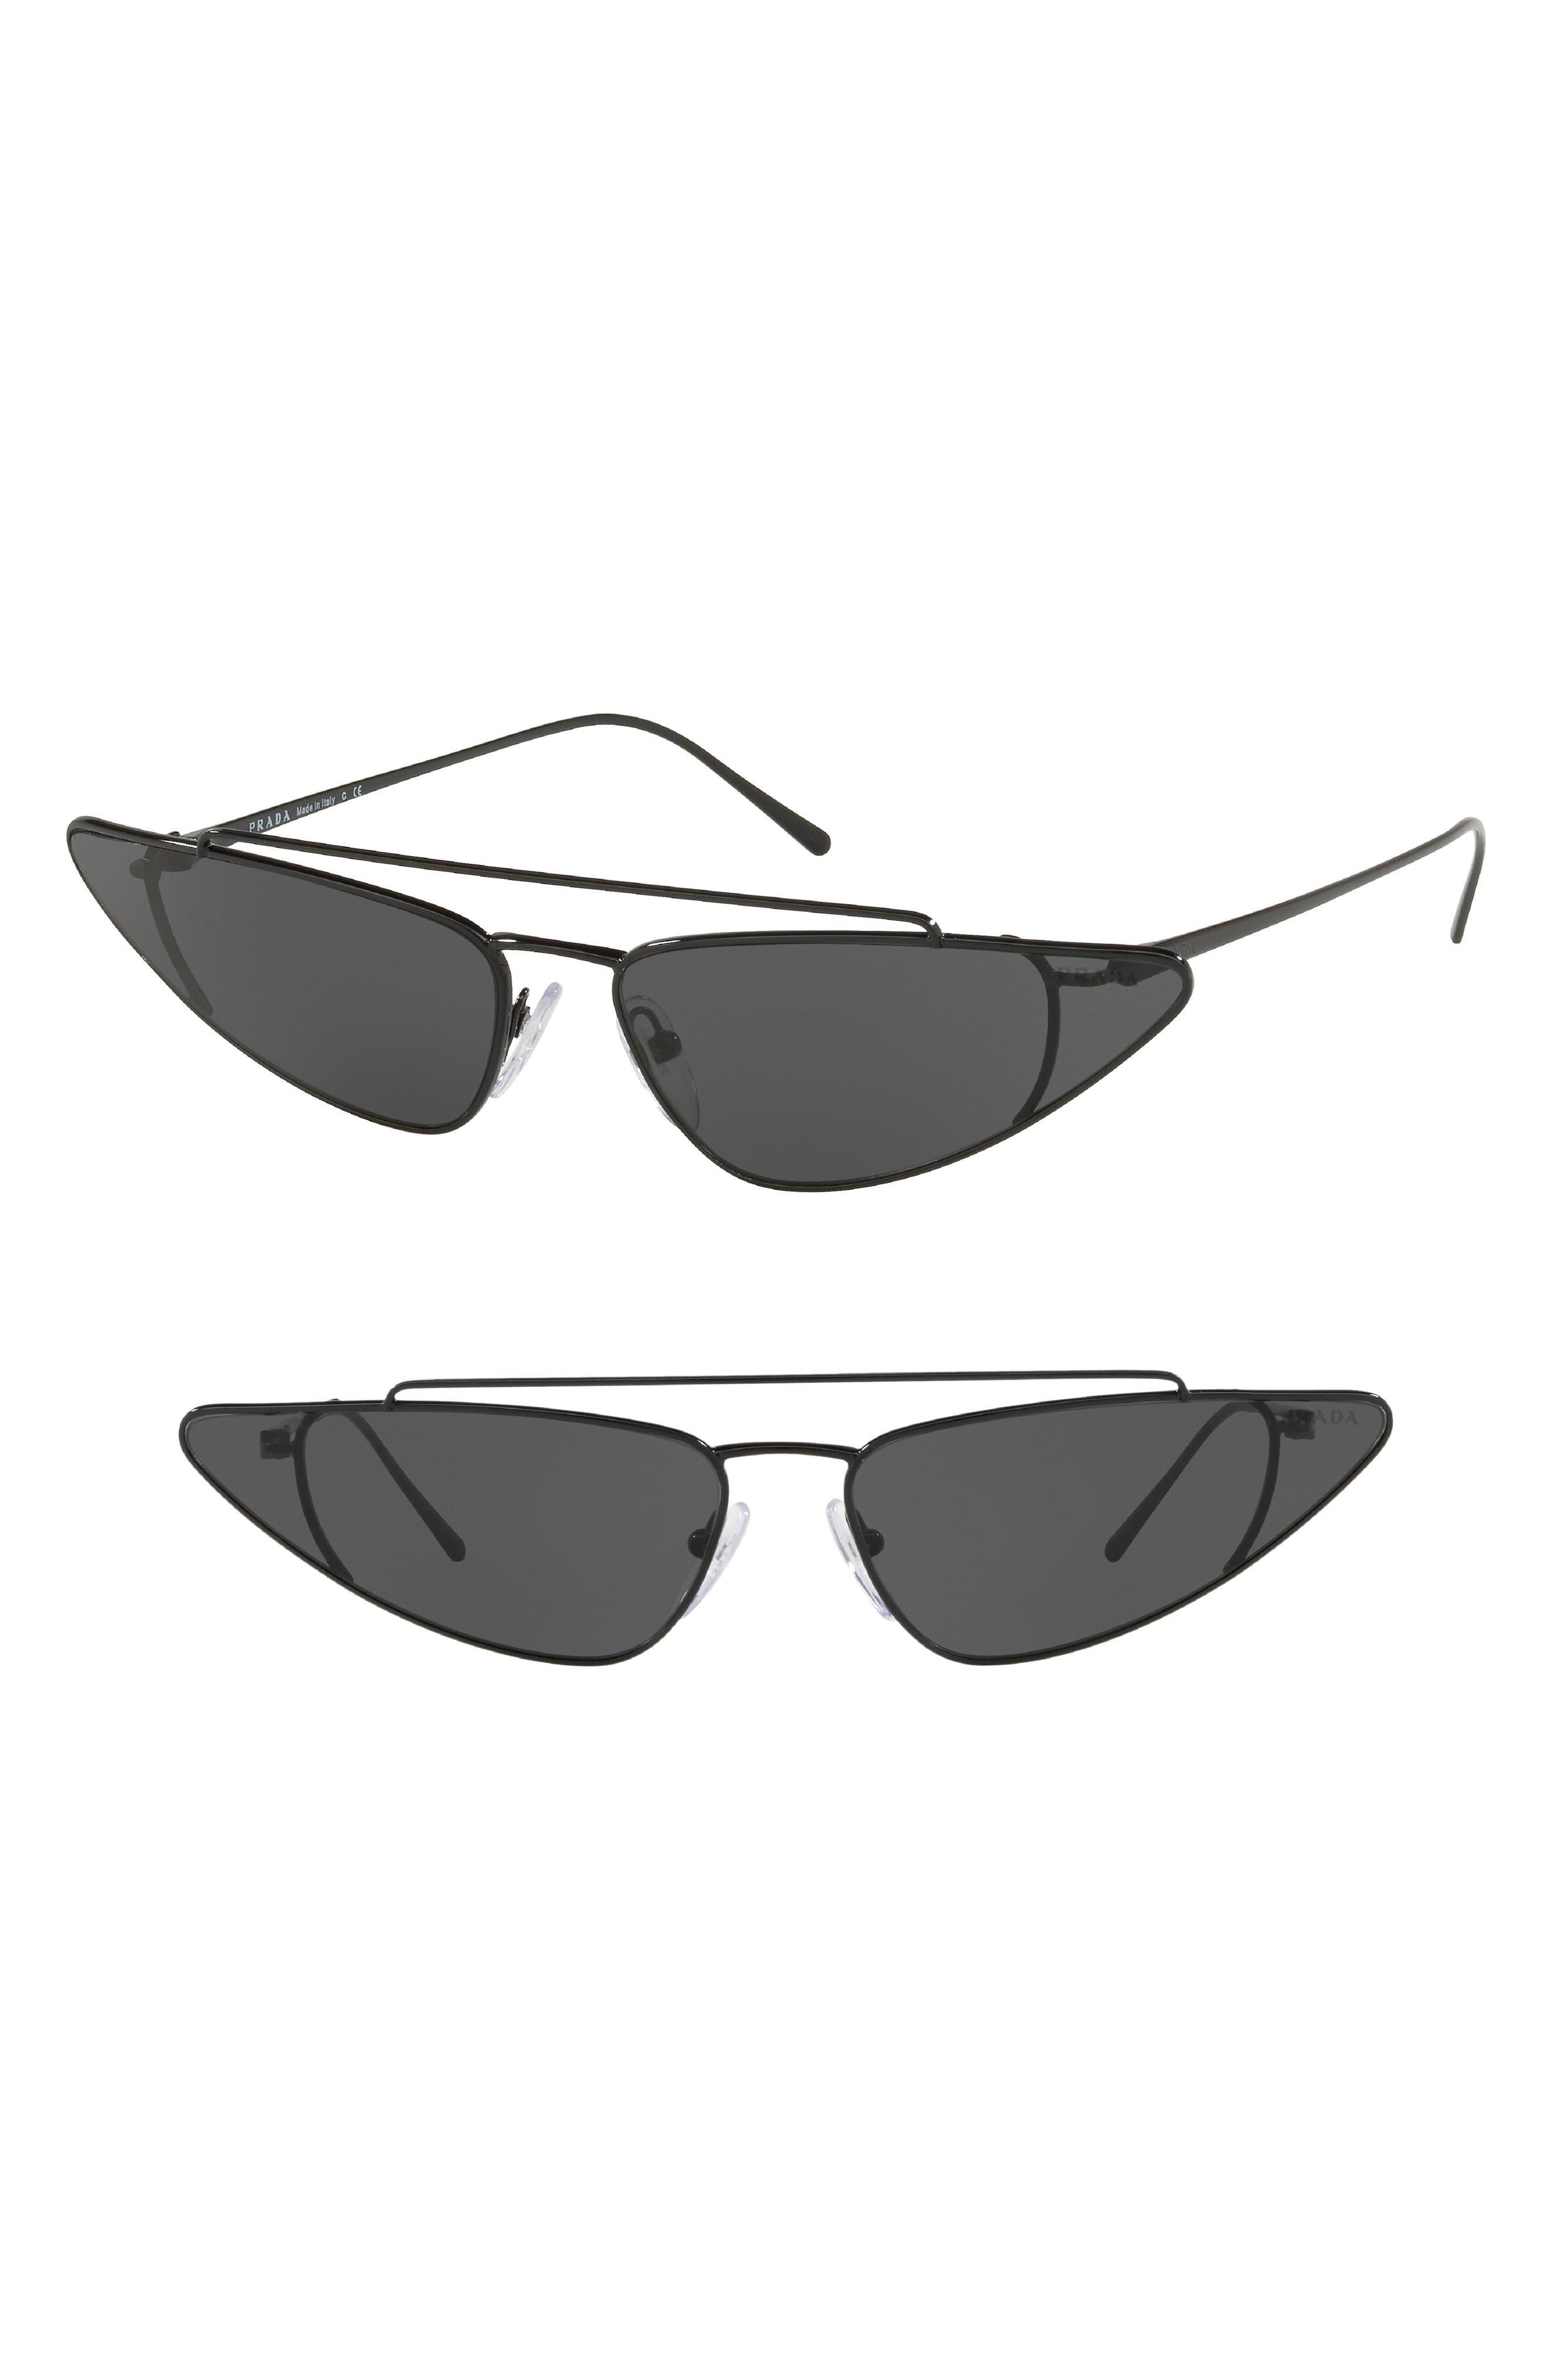 Ultravox 68mm Oversize Cat Eye Sunglasses,                         Main,                         color, BLACK SOLID